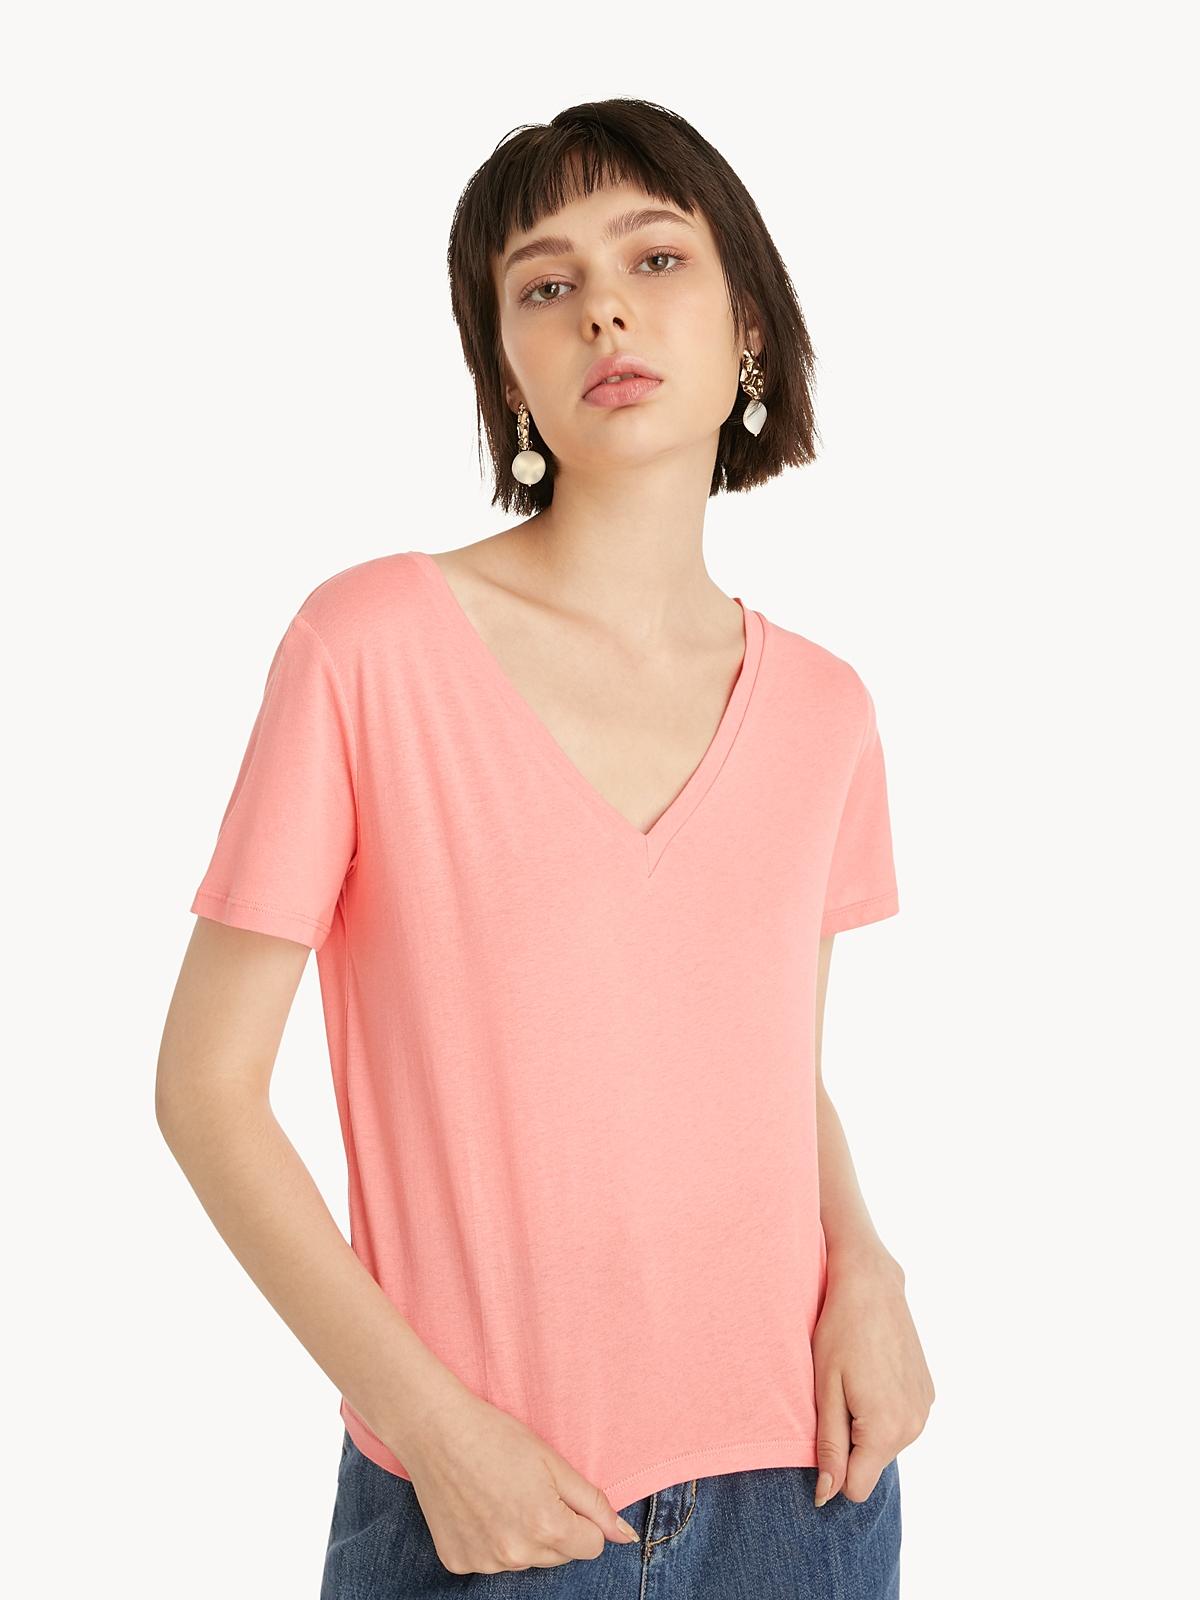 Wide VNeck Tee Pink